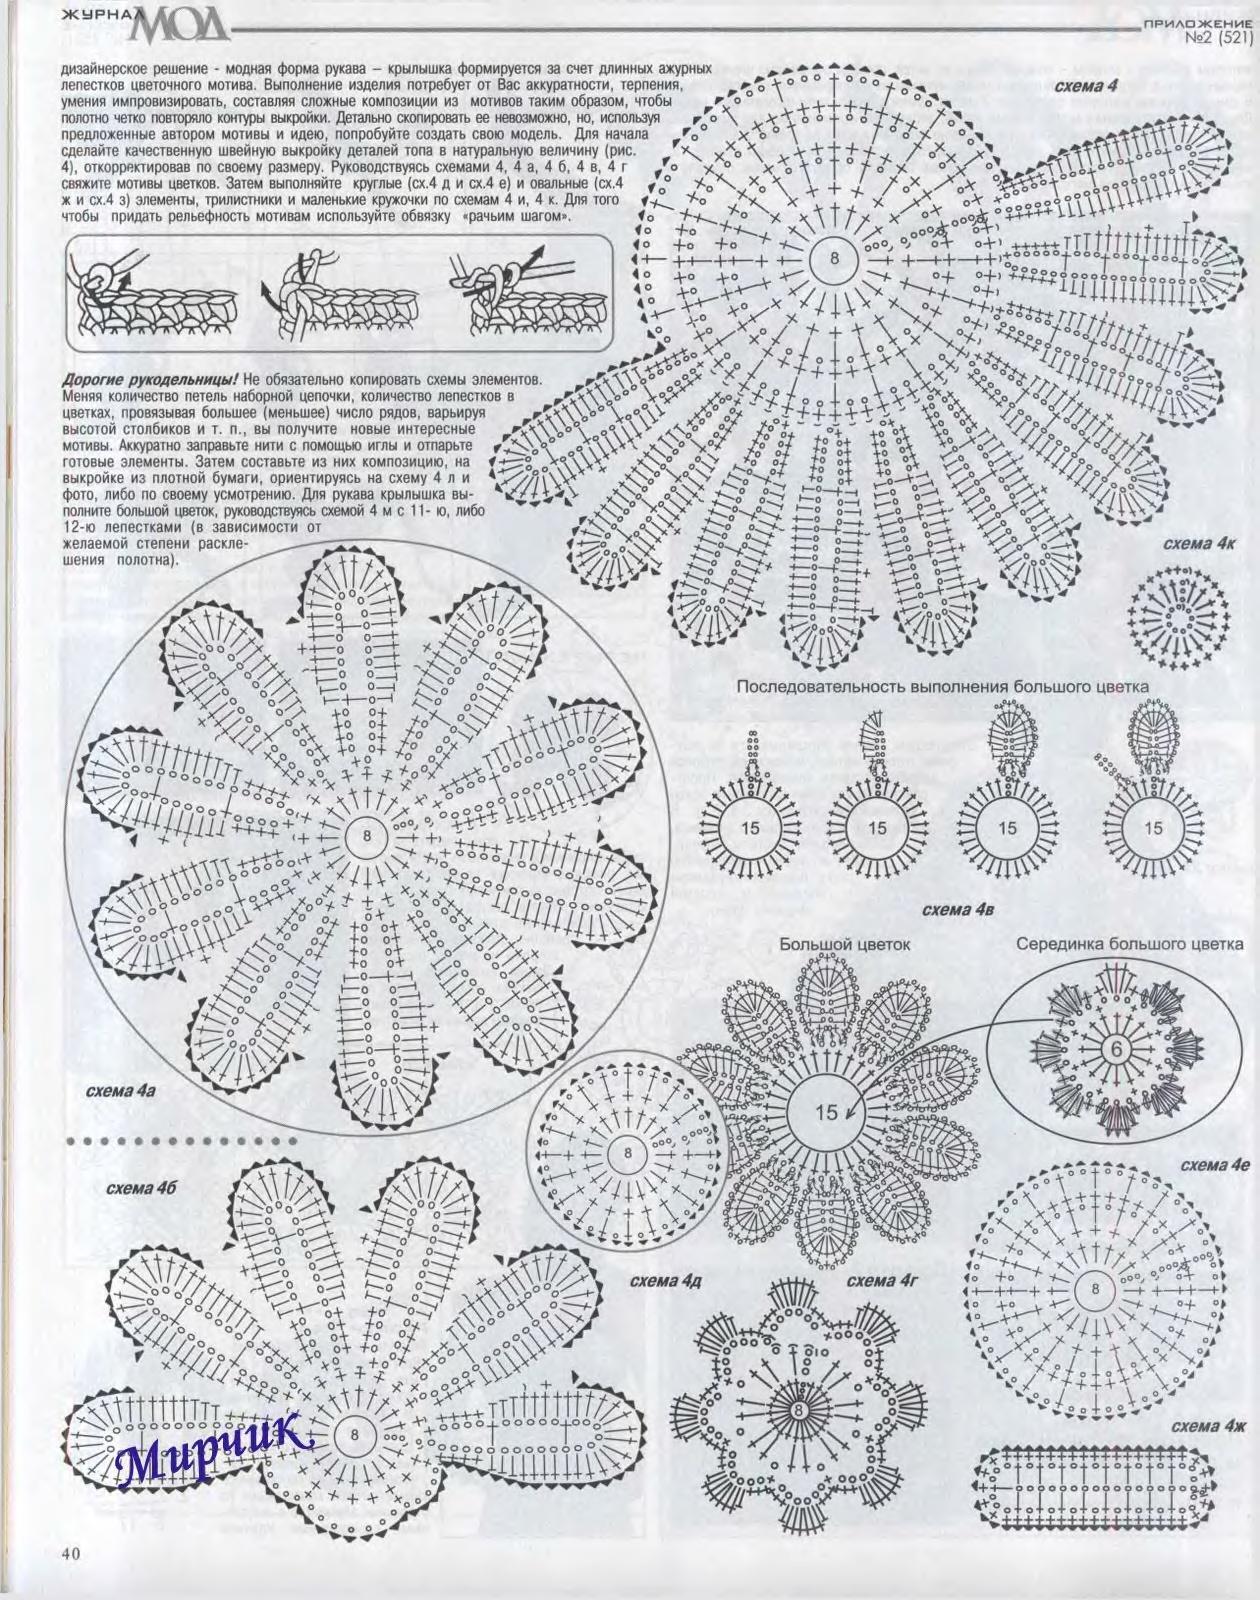 http://make-handmade.com/wp-content/uploads/2013/02/crochet-lace-top-skirt-ladies-make-handmade-64.jpeg